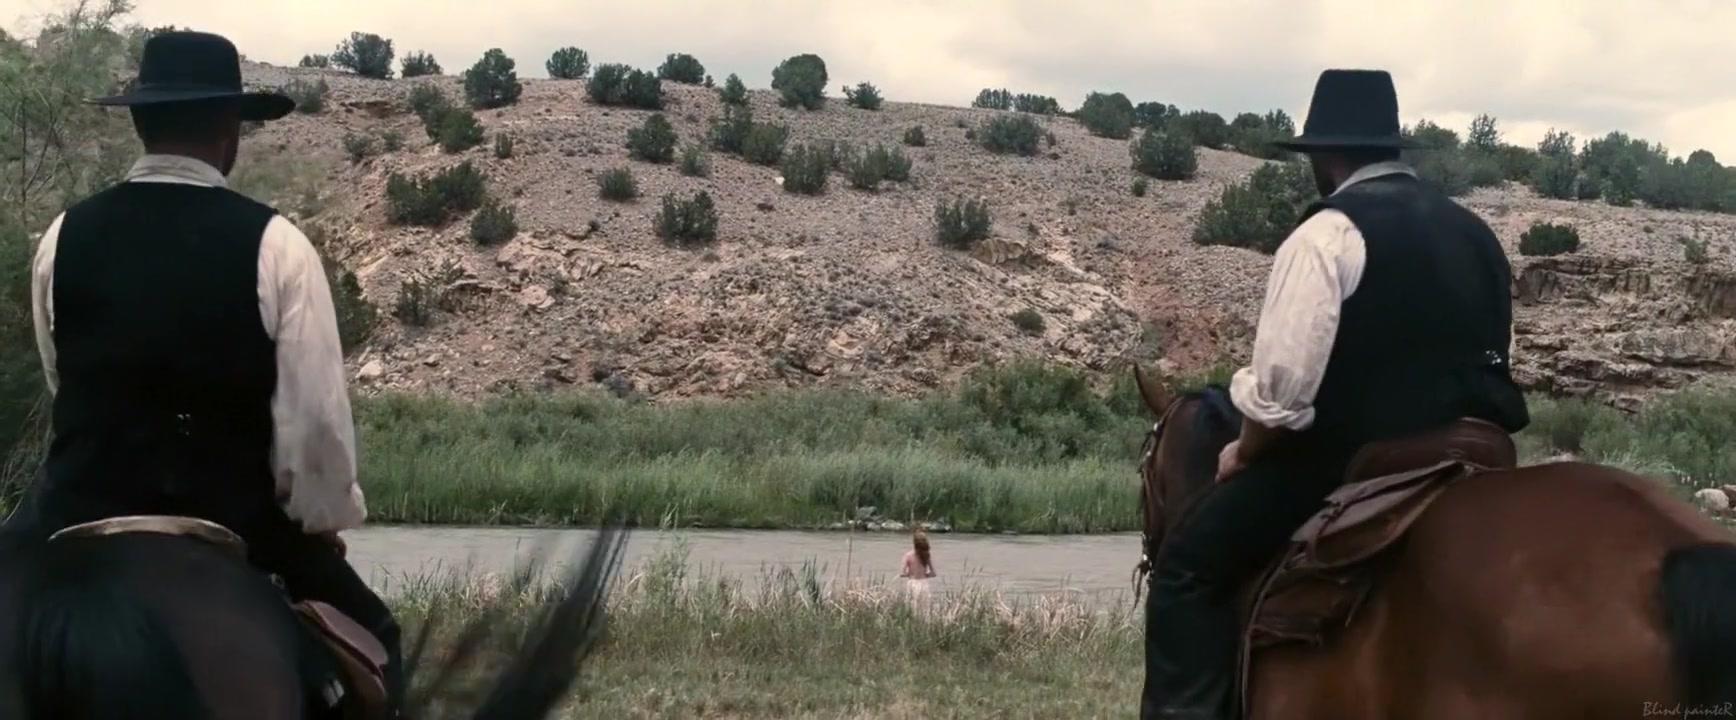 Hot xXx Video Chivas vs tijuana online dating